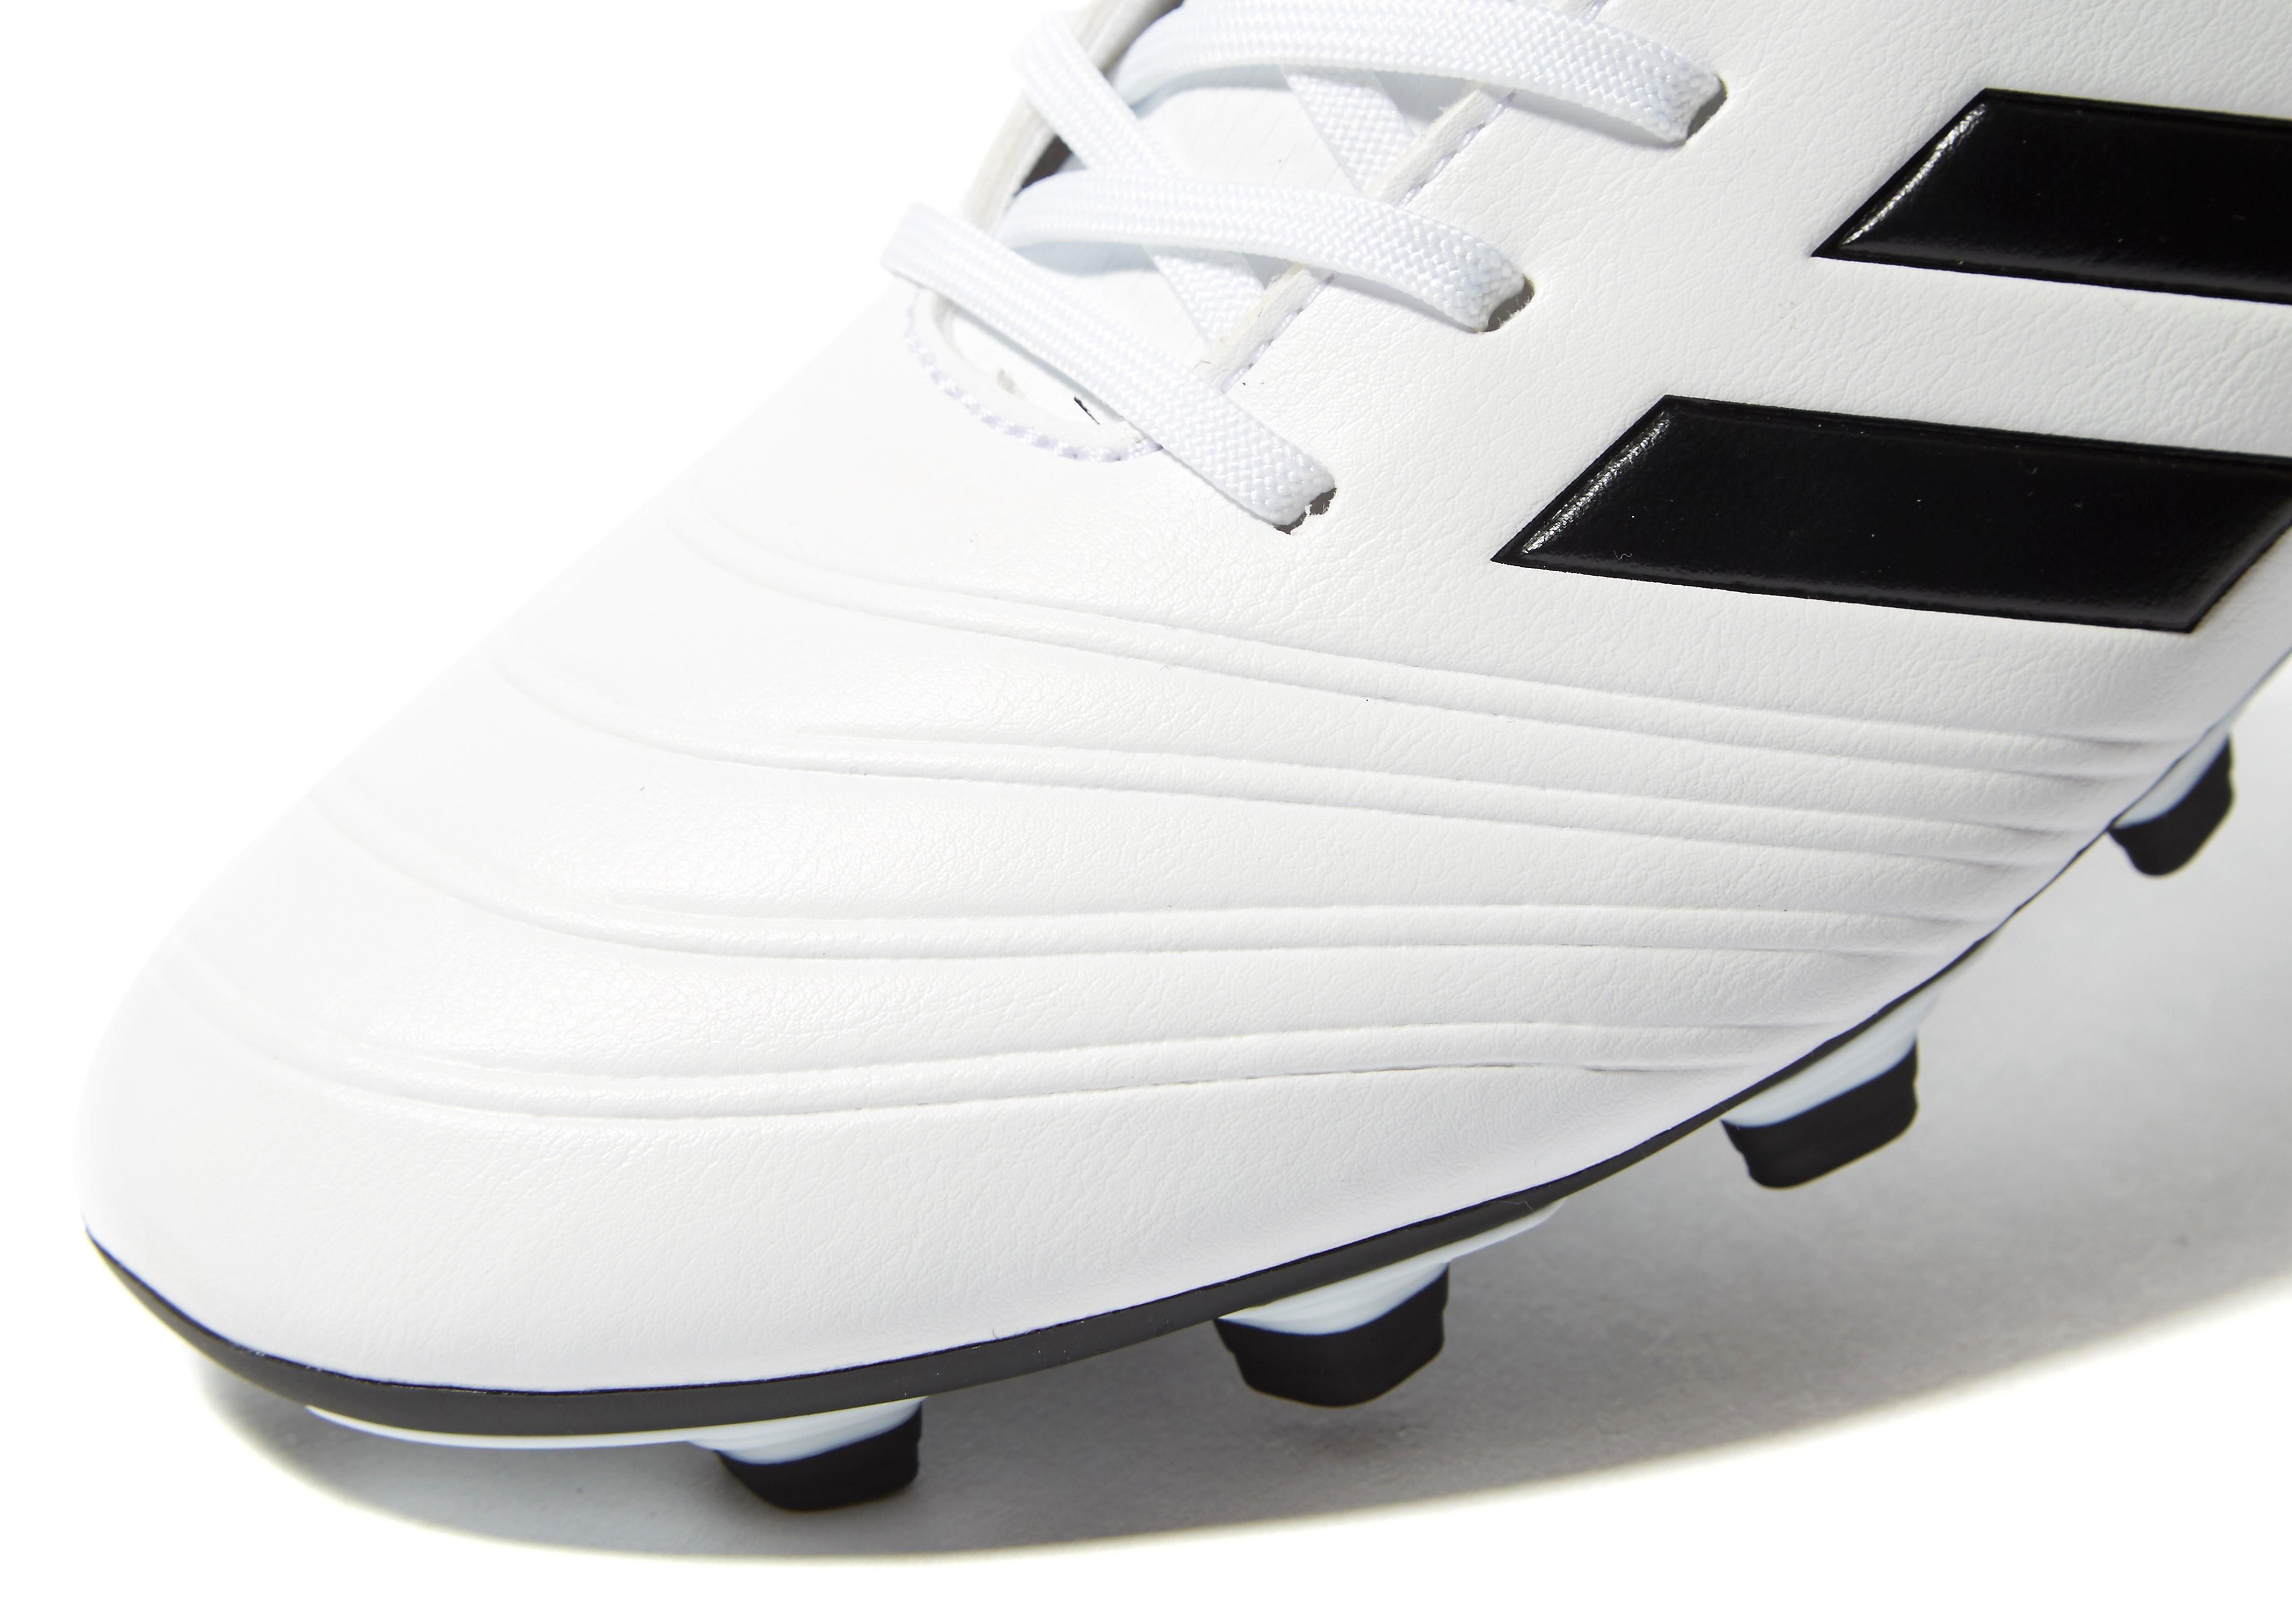 adidas SkyStalker Copa 18.4 FG